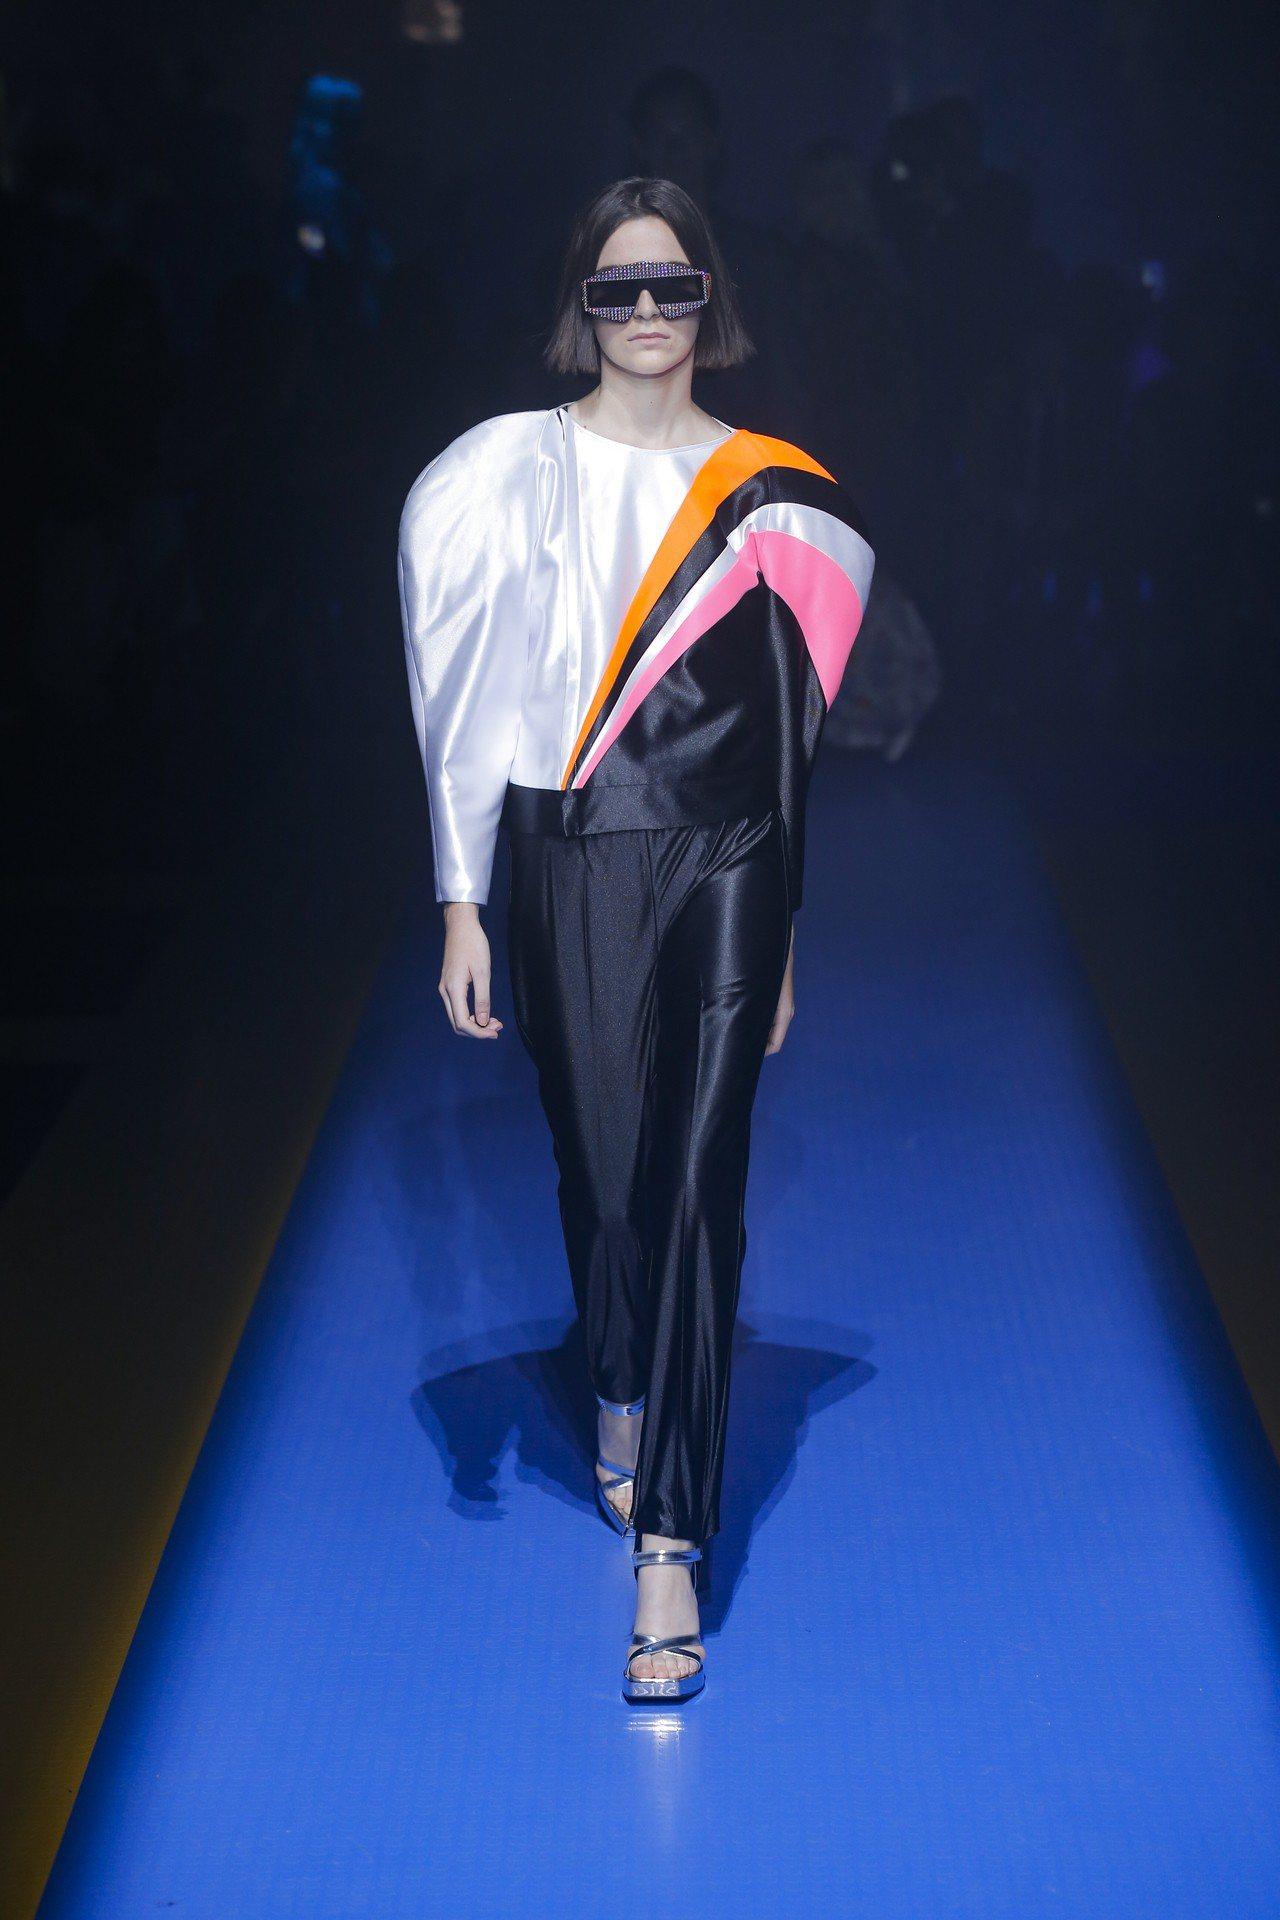 Gucci早在2018春夏系列中就從傳奇巨星艾爾頓強當年帶起的華麗搖滾風格表演服...